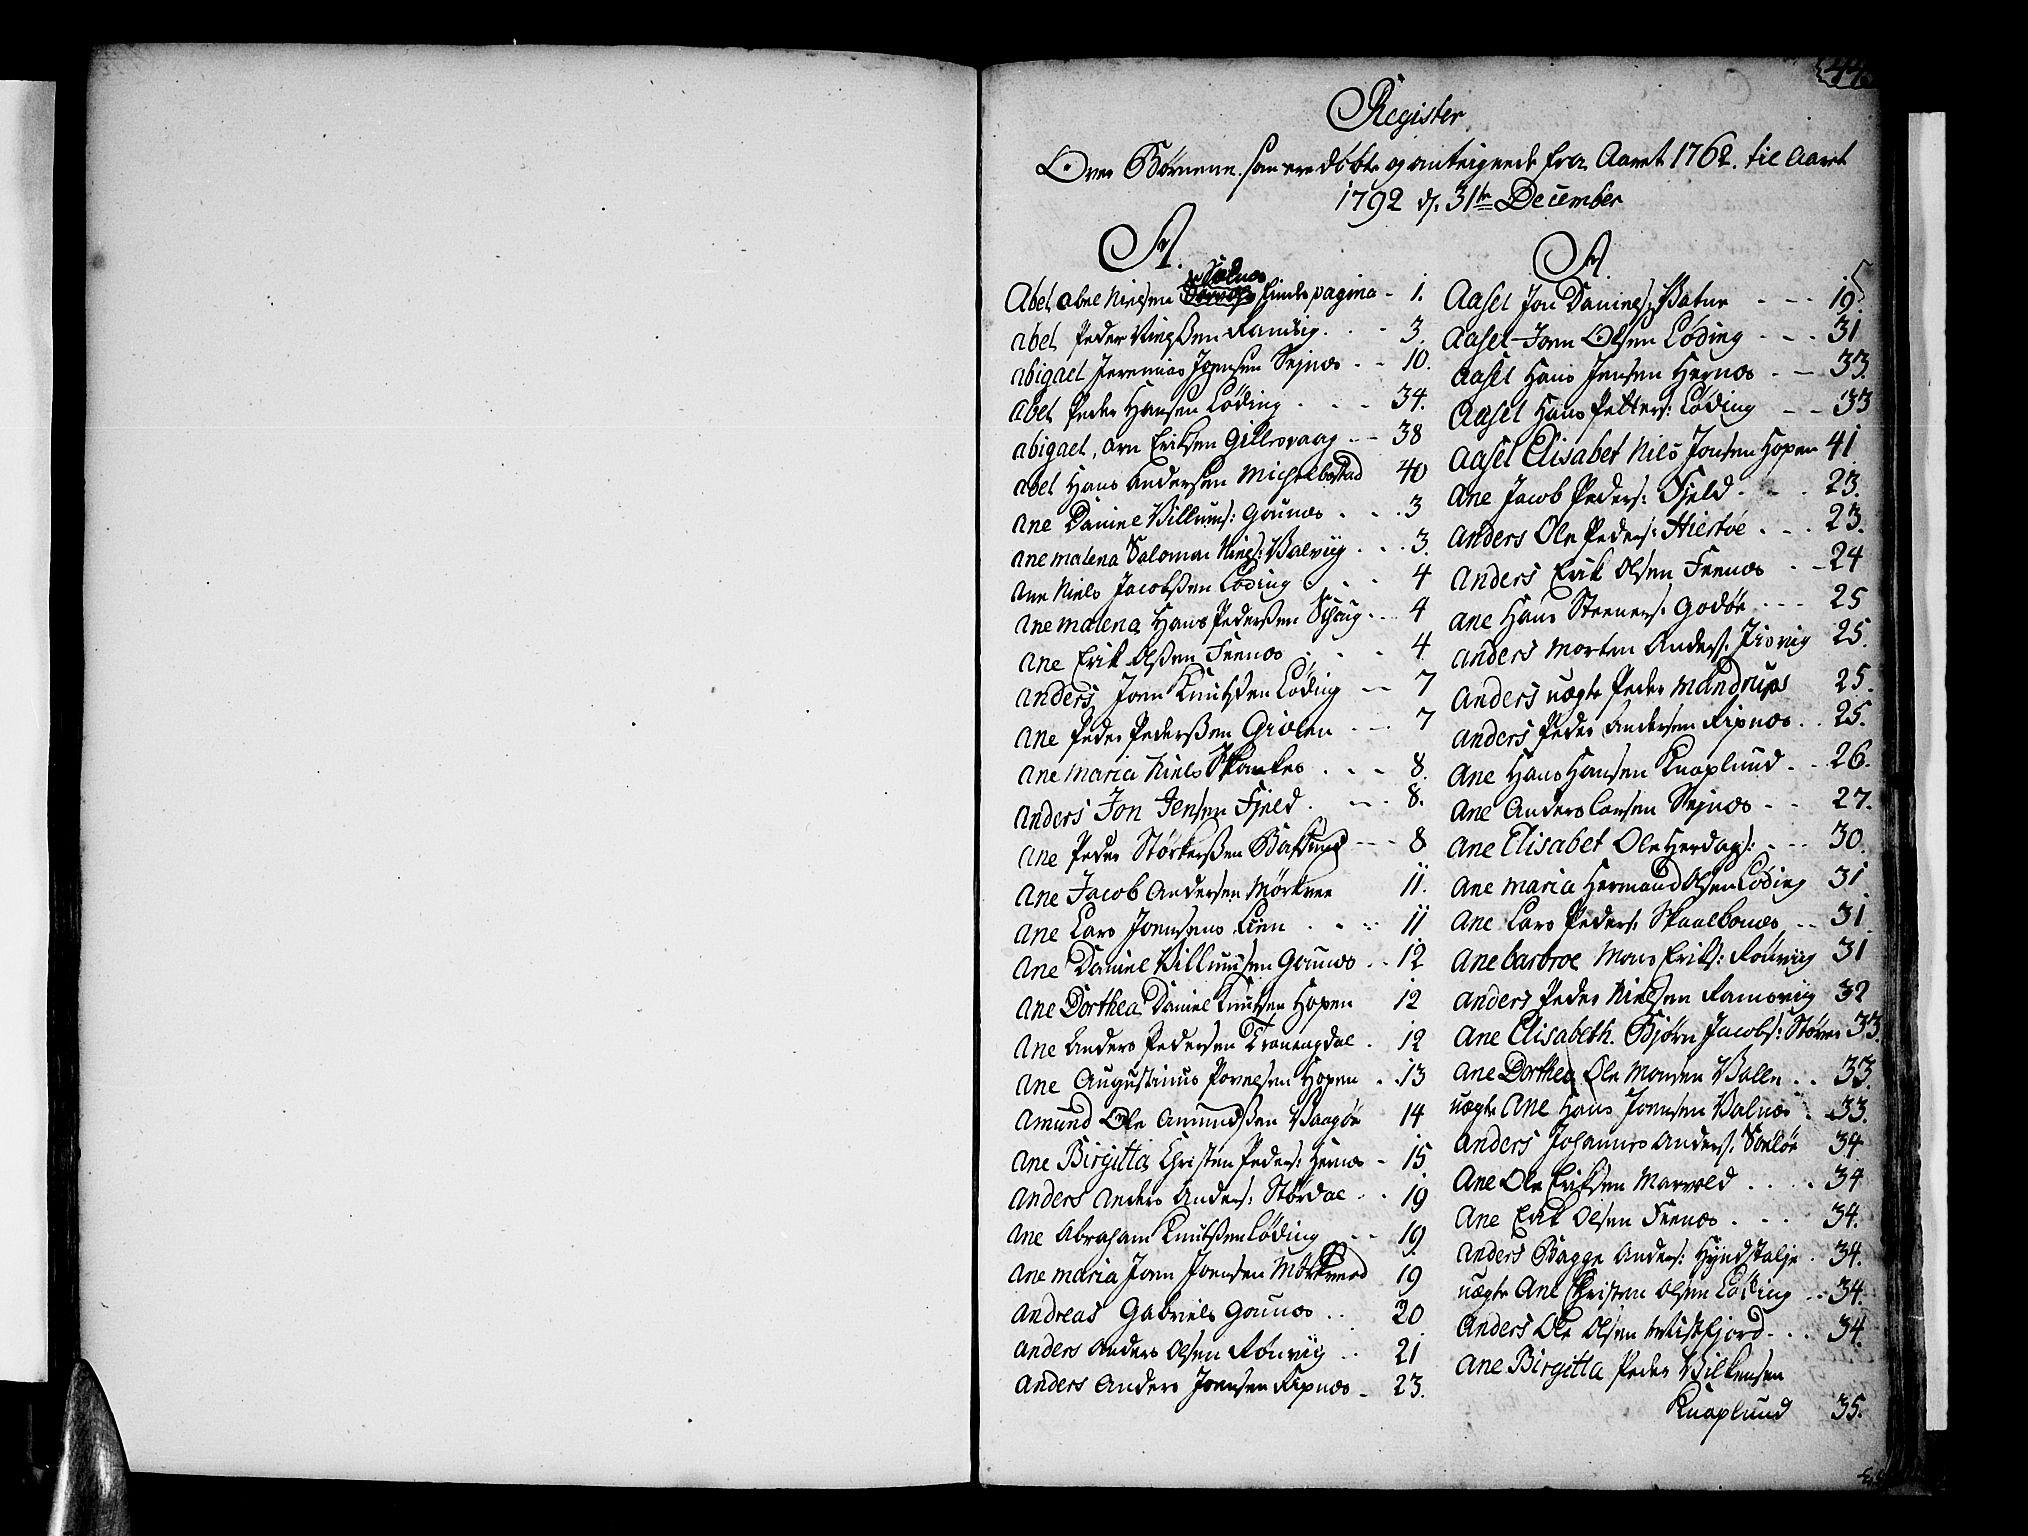 SAT, Ministerialprotokoller, klokkerbøker og fødselsregistre - Nordland, 801/L0003: Ministerialbok nr. 801A03, 1762-1795, s. 443